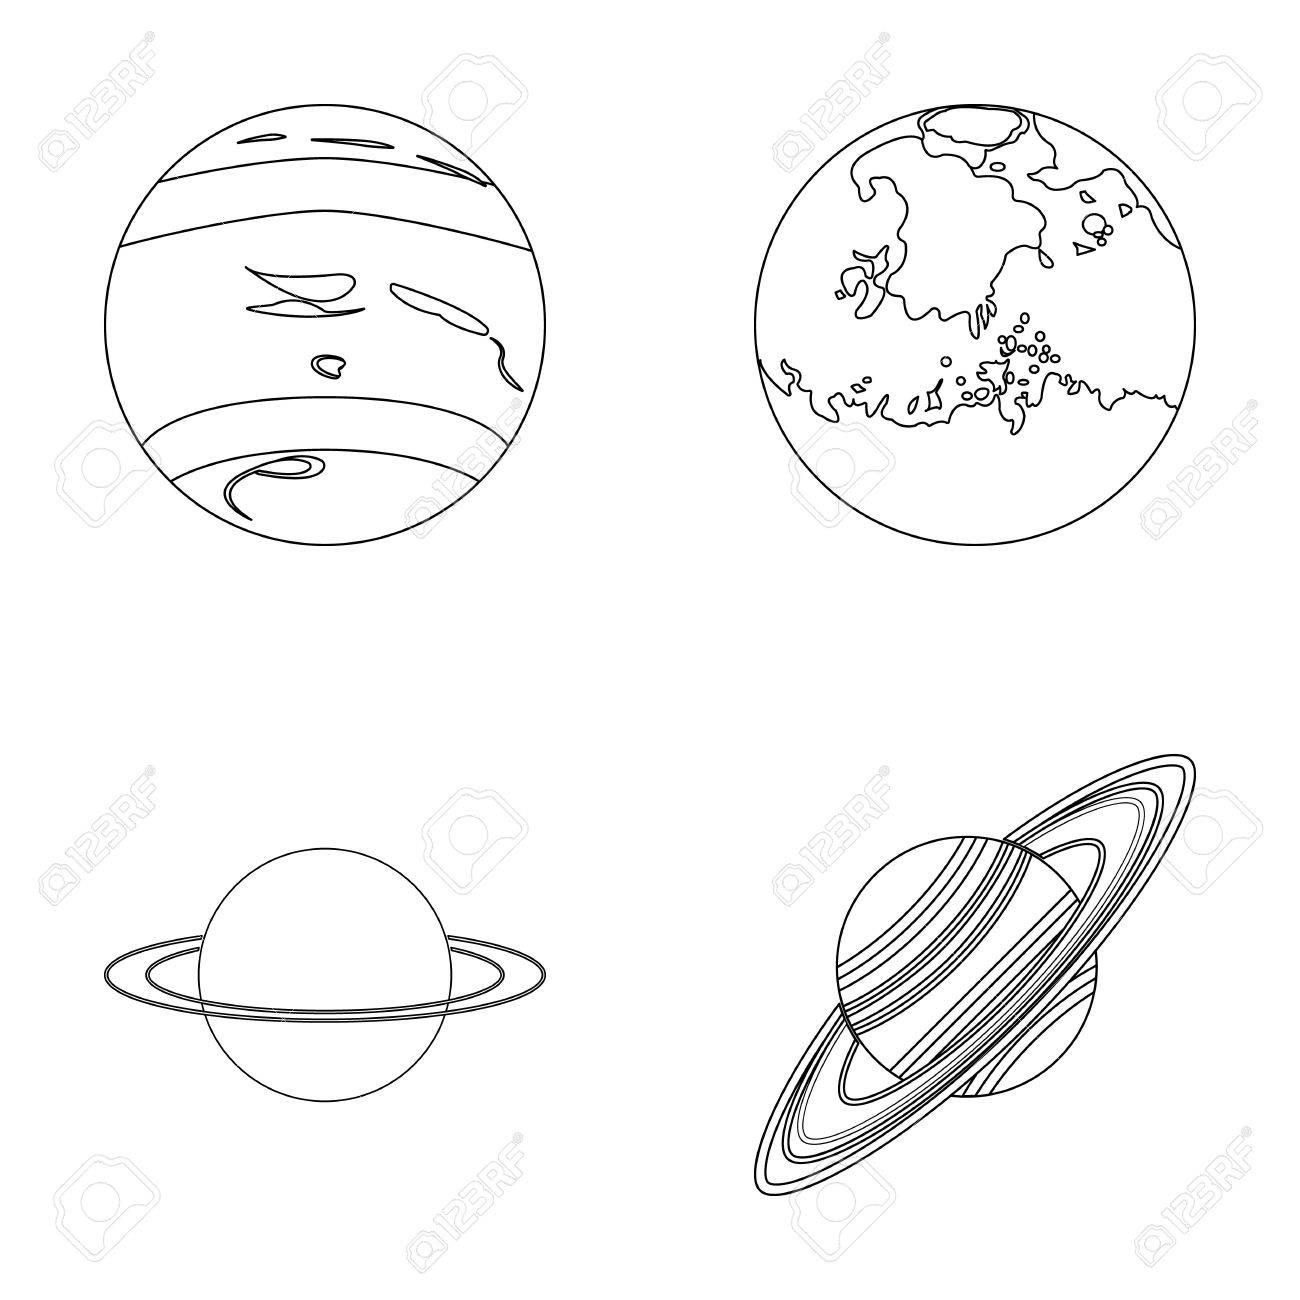 1300x1300 Neptune, Mars, Saturn, Uranus Of The Solar System. Planets Set